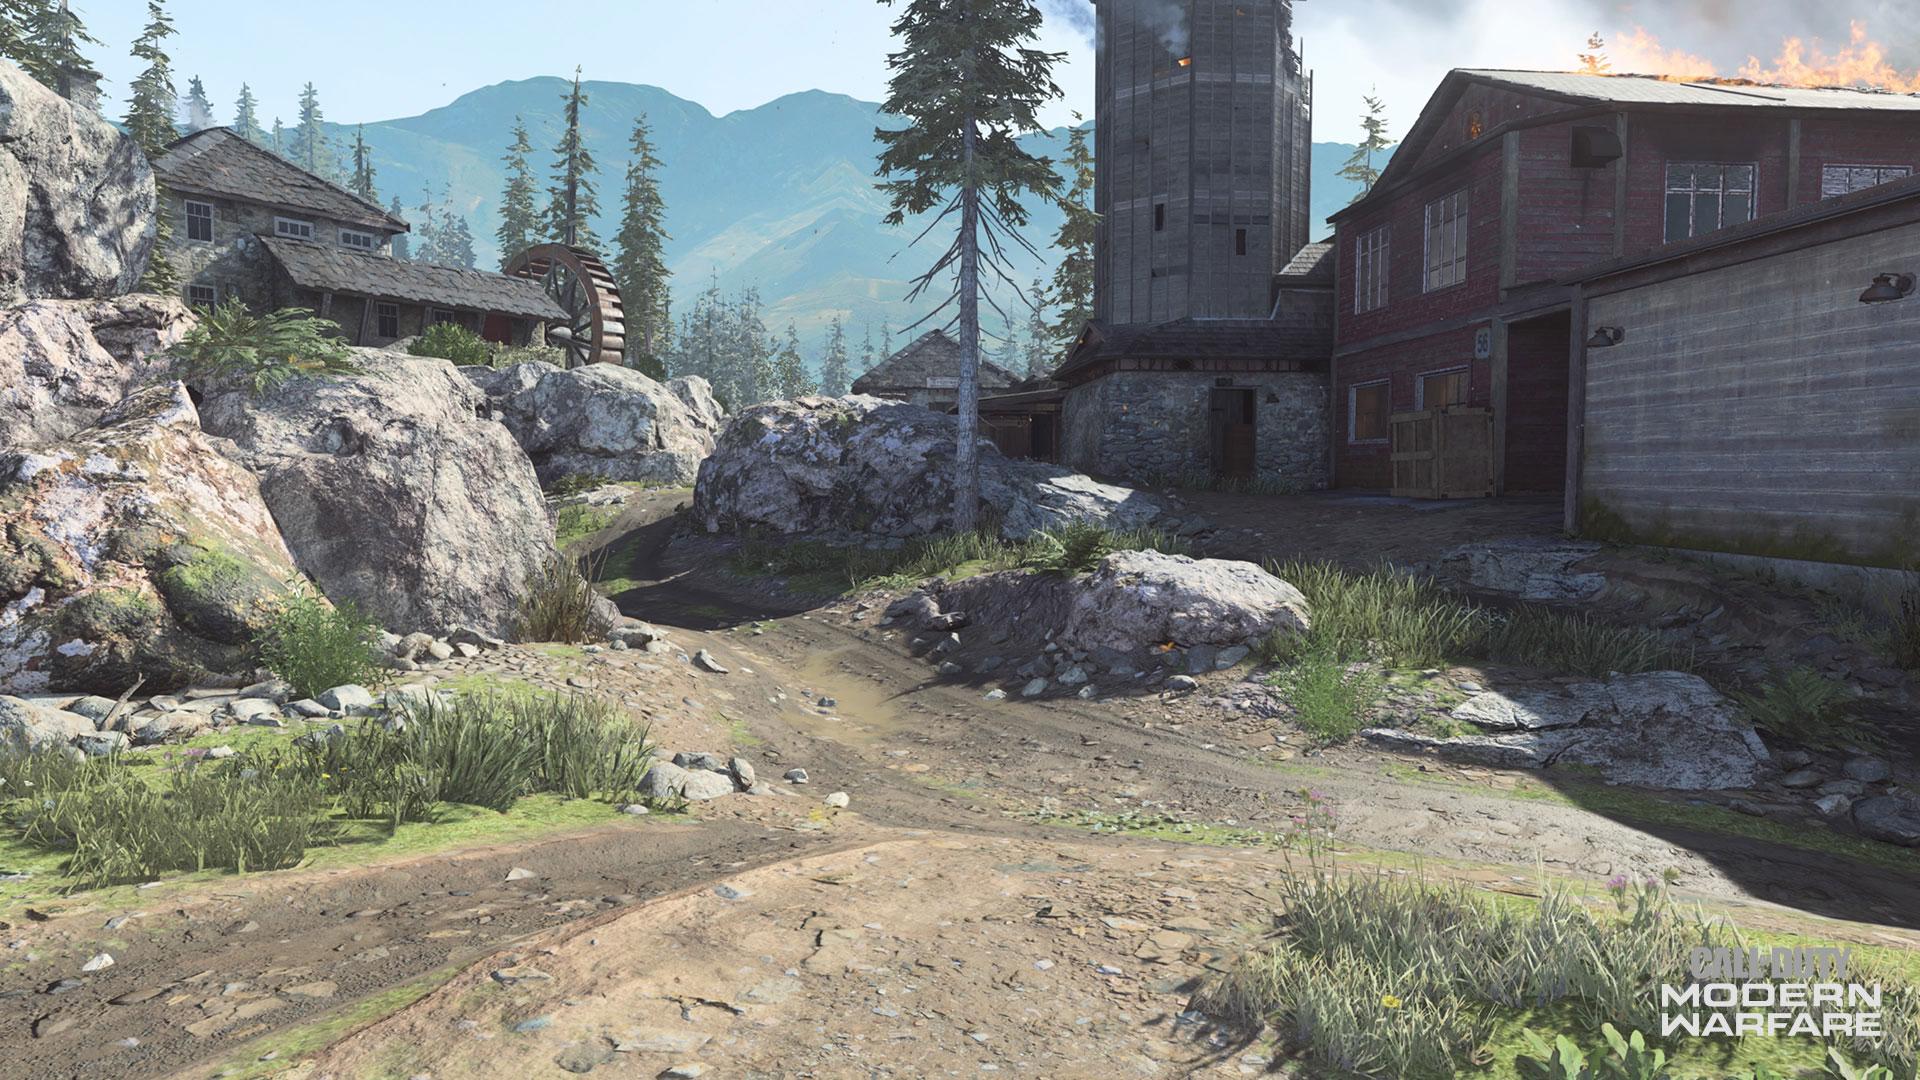 Modern Warfare® Tactical Map Intel: Hovec Sawmill - Image 6